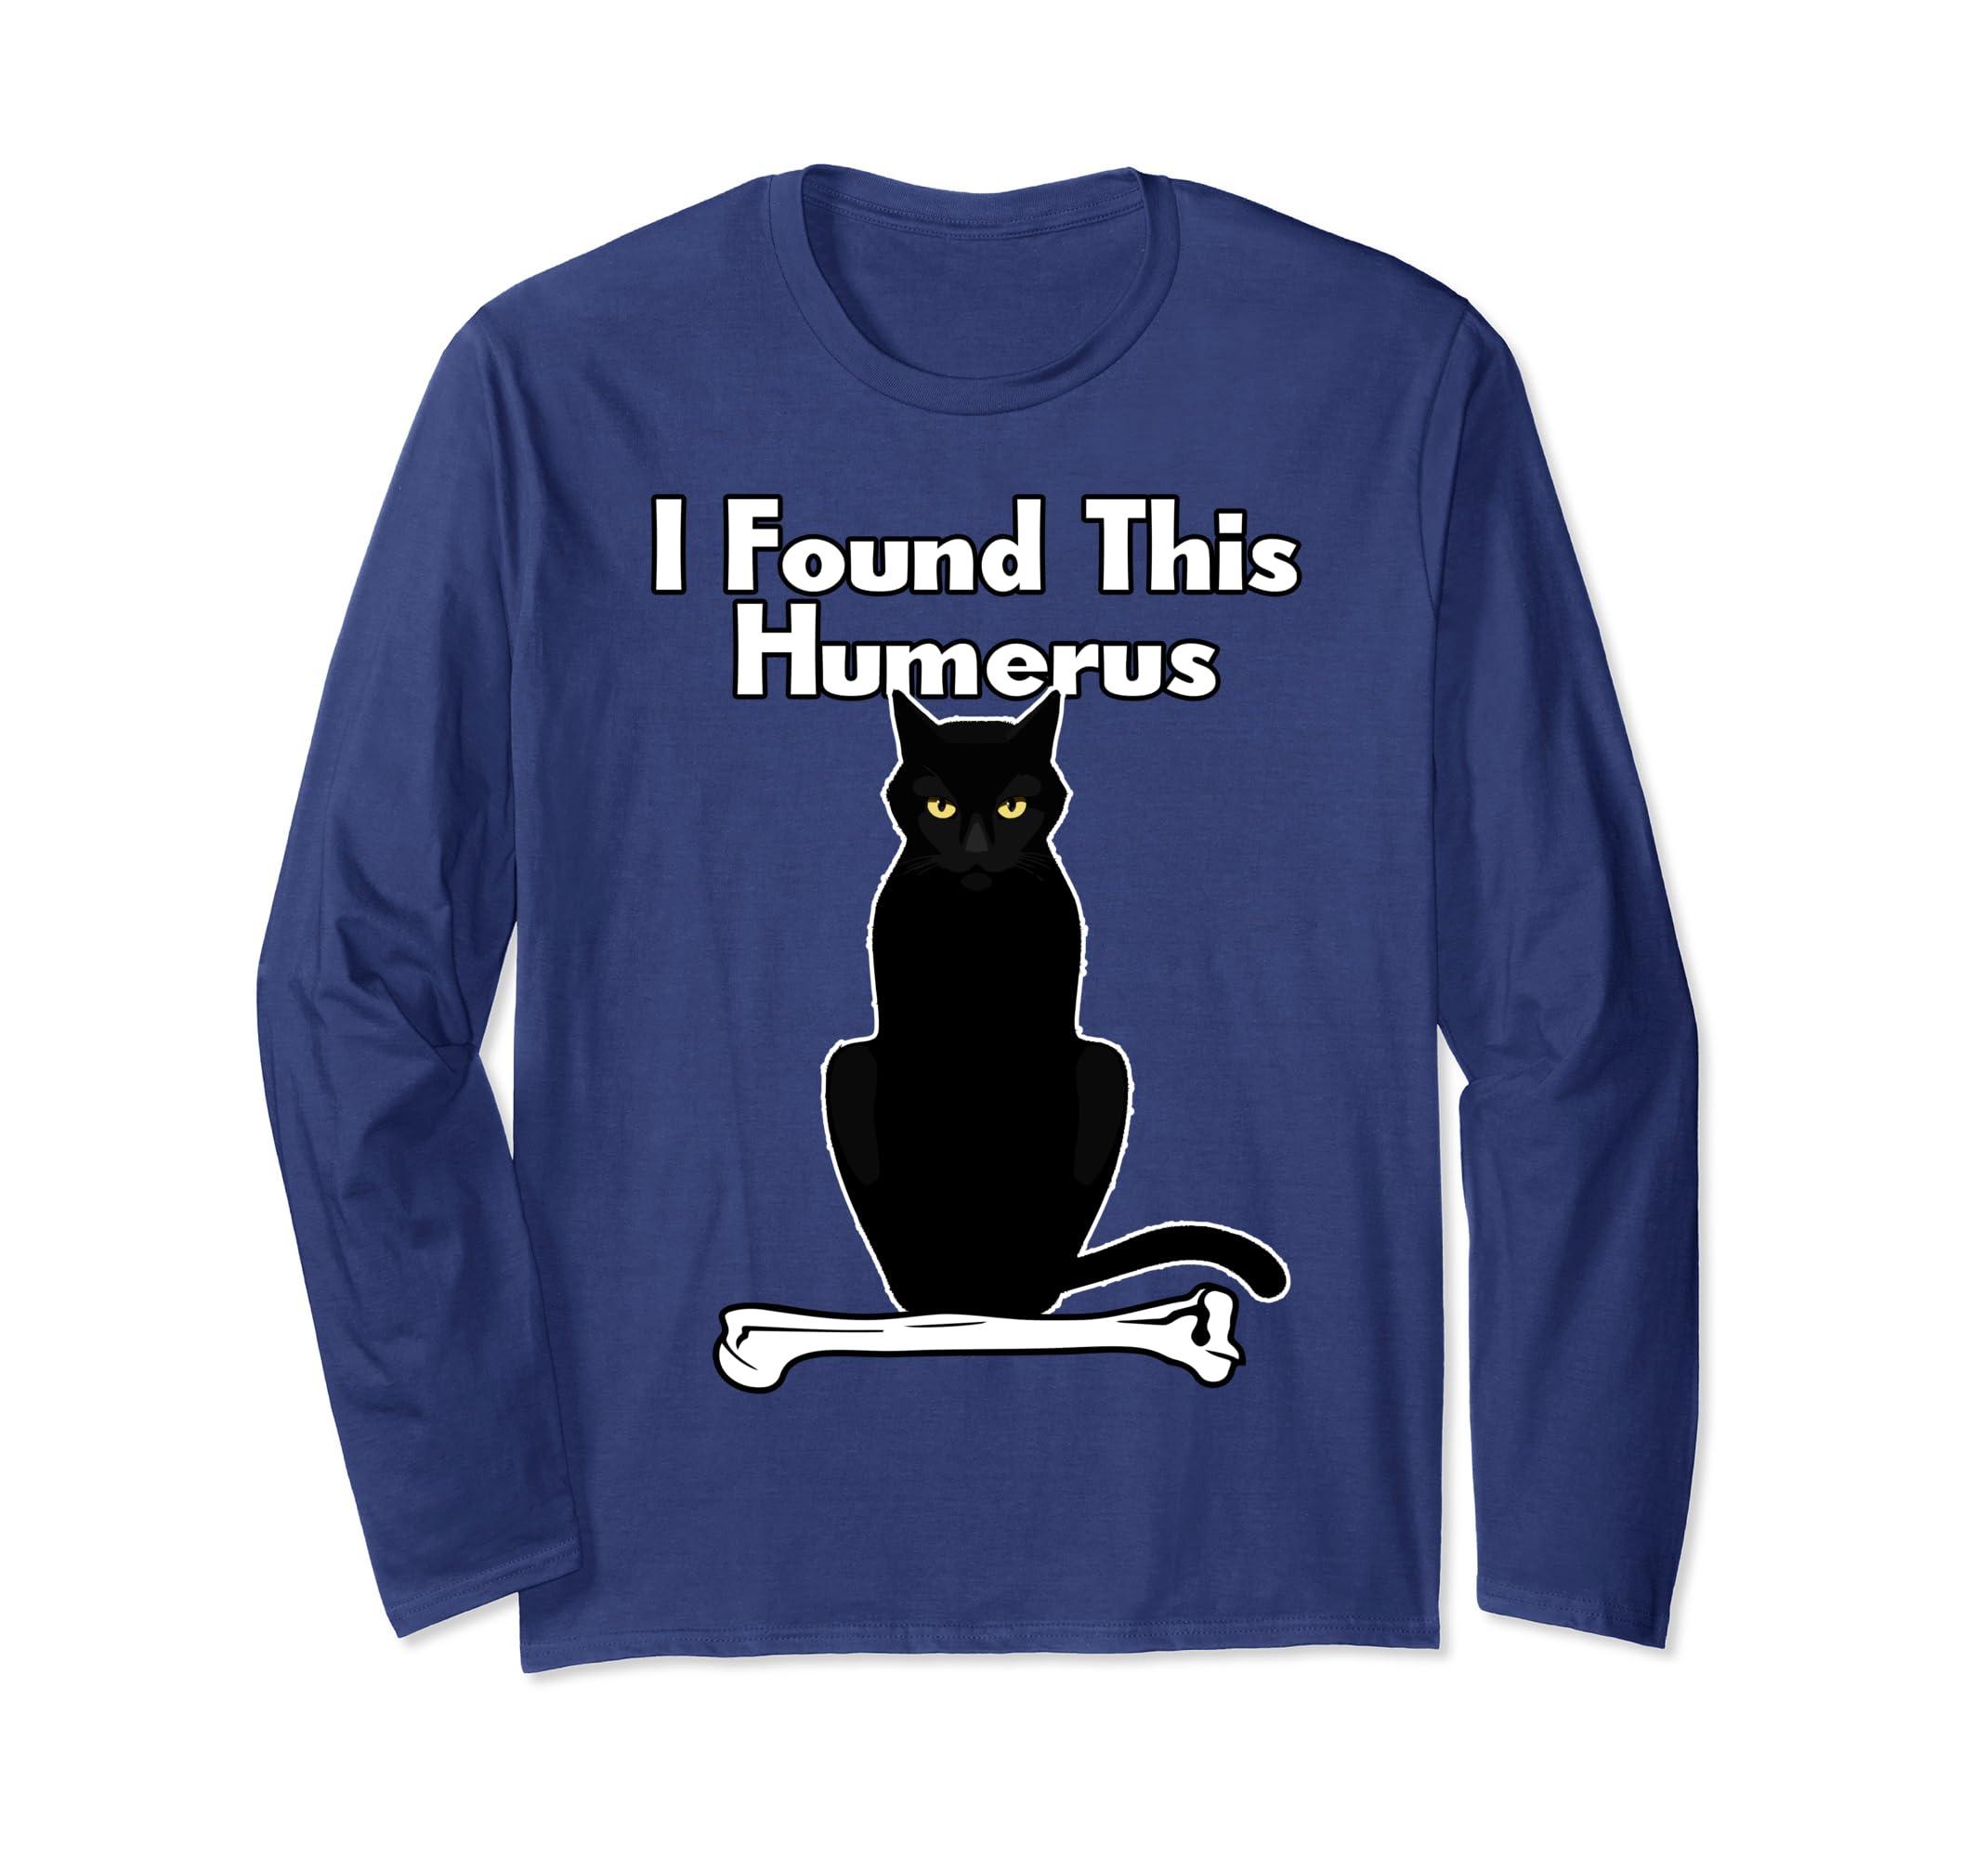 9f965feda Amazon.com: Cat Shirt I Found This Humerus Cat Long Sleeve Shirt: Clothing